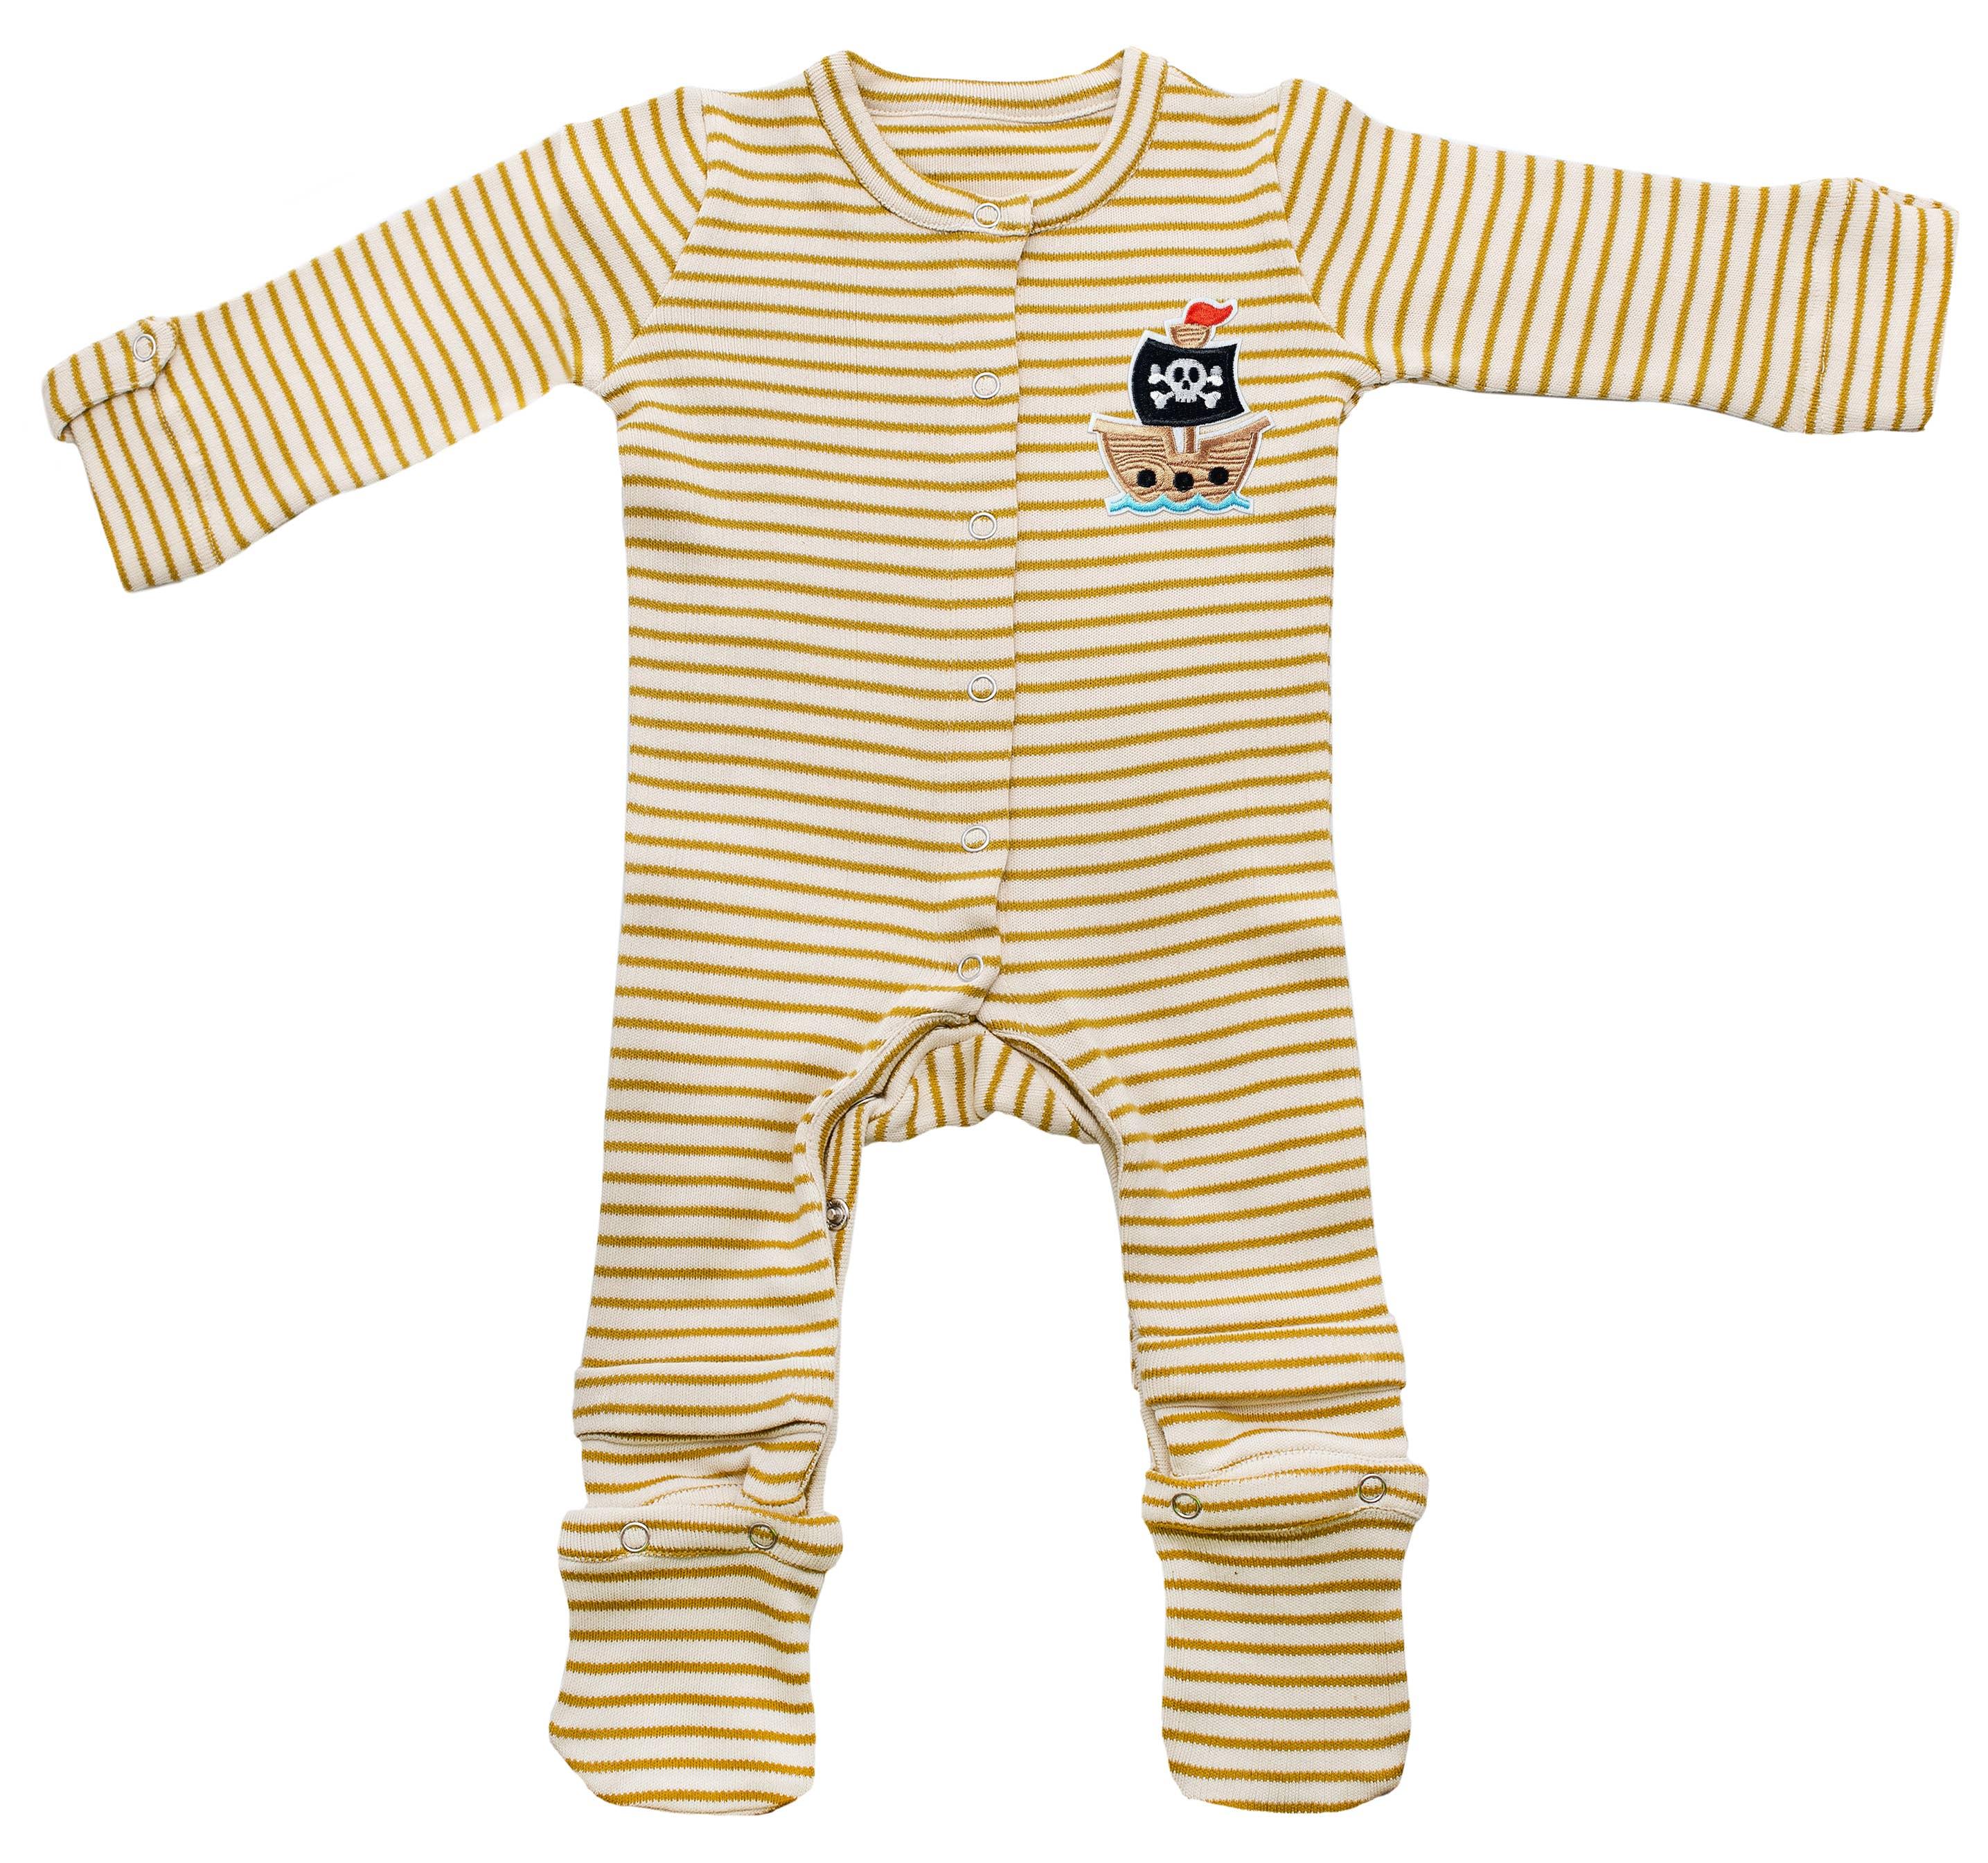 Ooops I Just Sharted Baby Grow BabyGrow Playsuit Gift Boy Girl Cute Funny